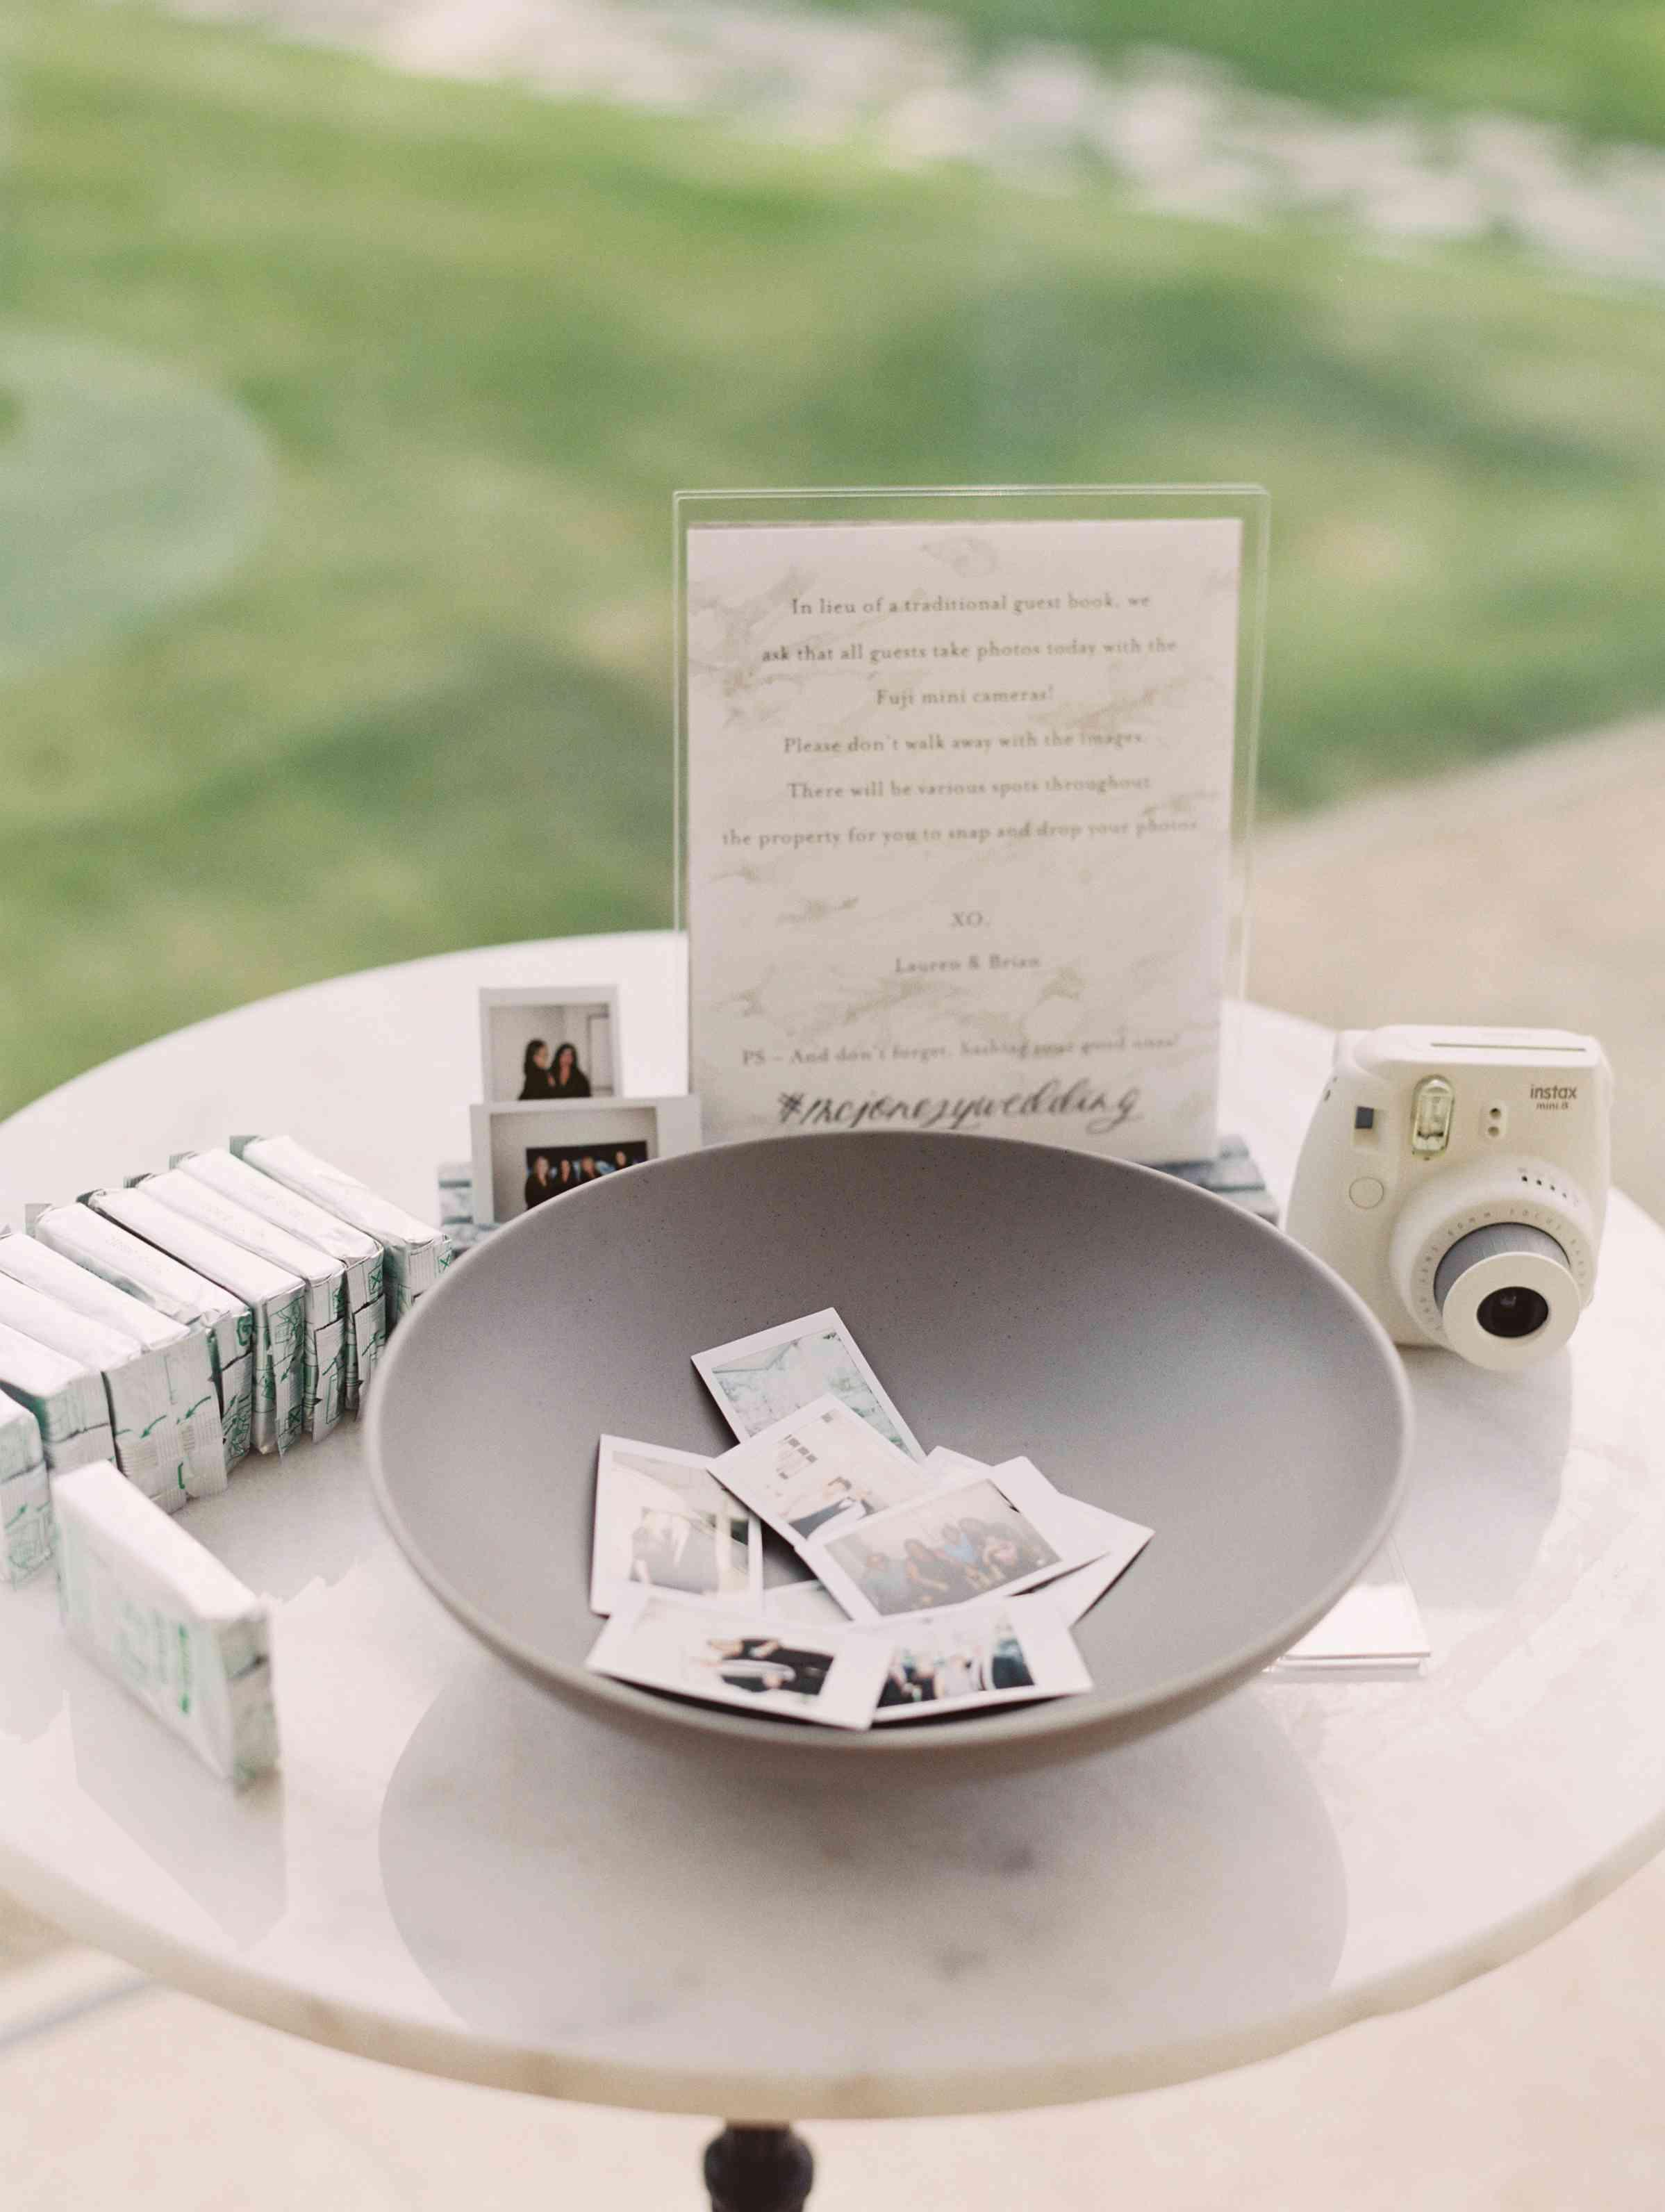 Polaroid selfie as wedding guest book